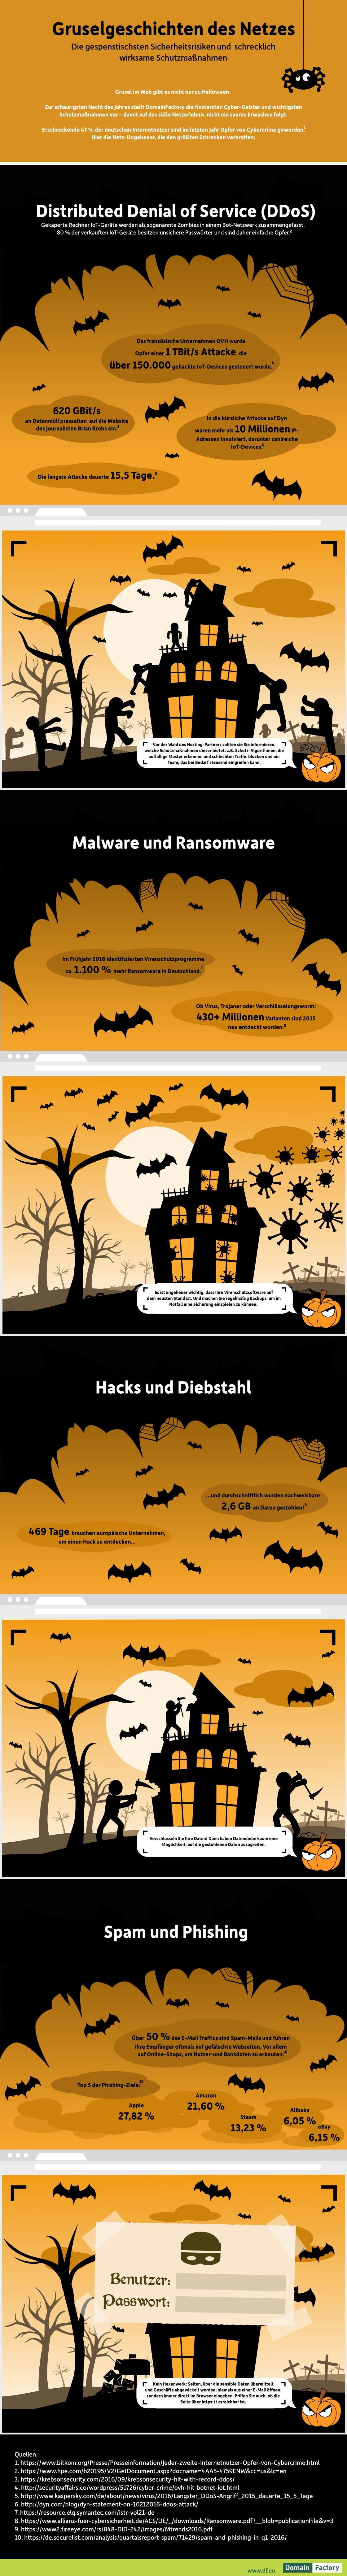 infografik-domainfactory-grusel-des-netzes